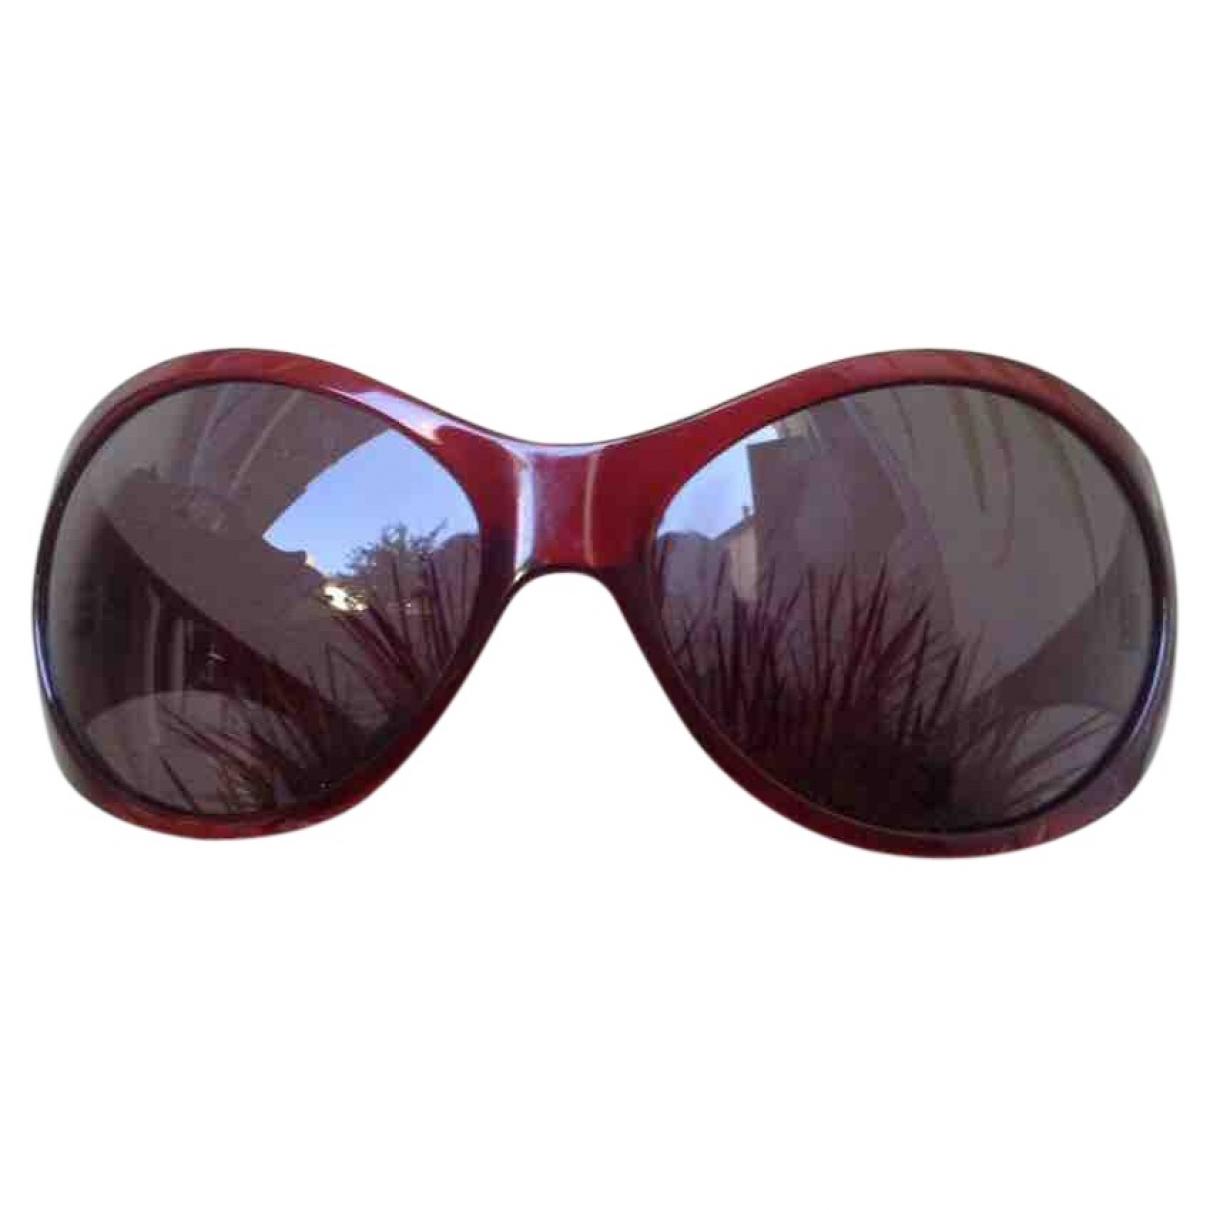 Miu Miu \N Burgundy Sunglasses for Women \N